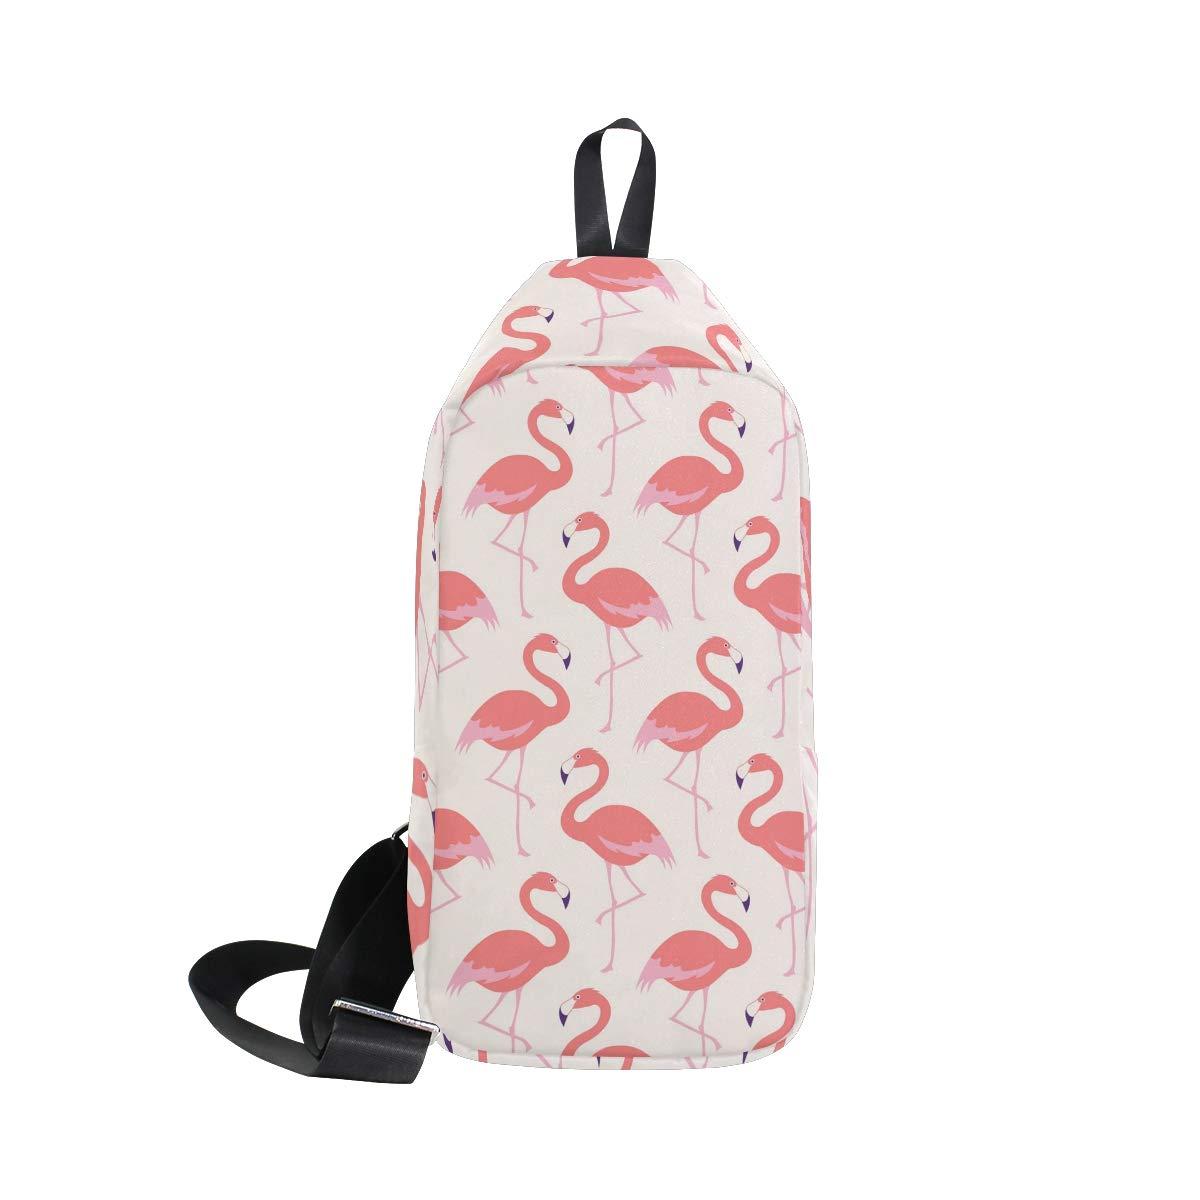 Unisex Messenger Bag Flamingo Bird Shoulder Chest Cross Body Backpack Bag